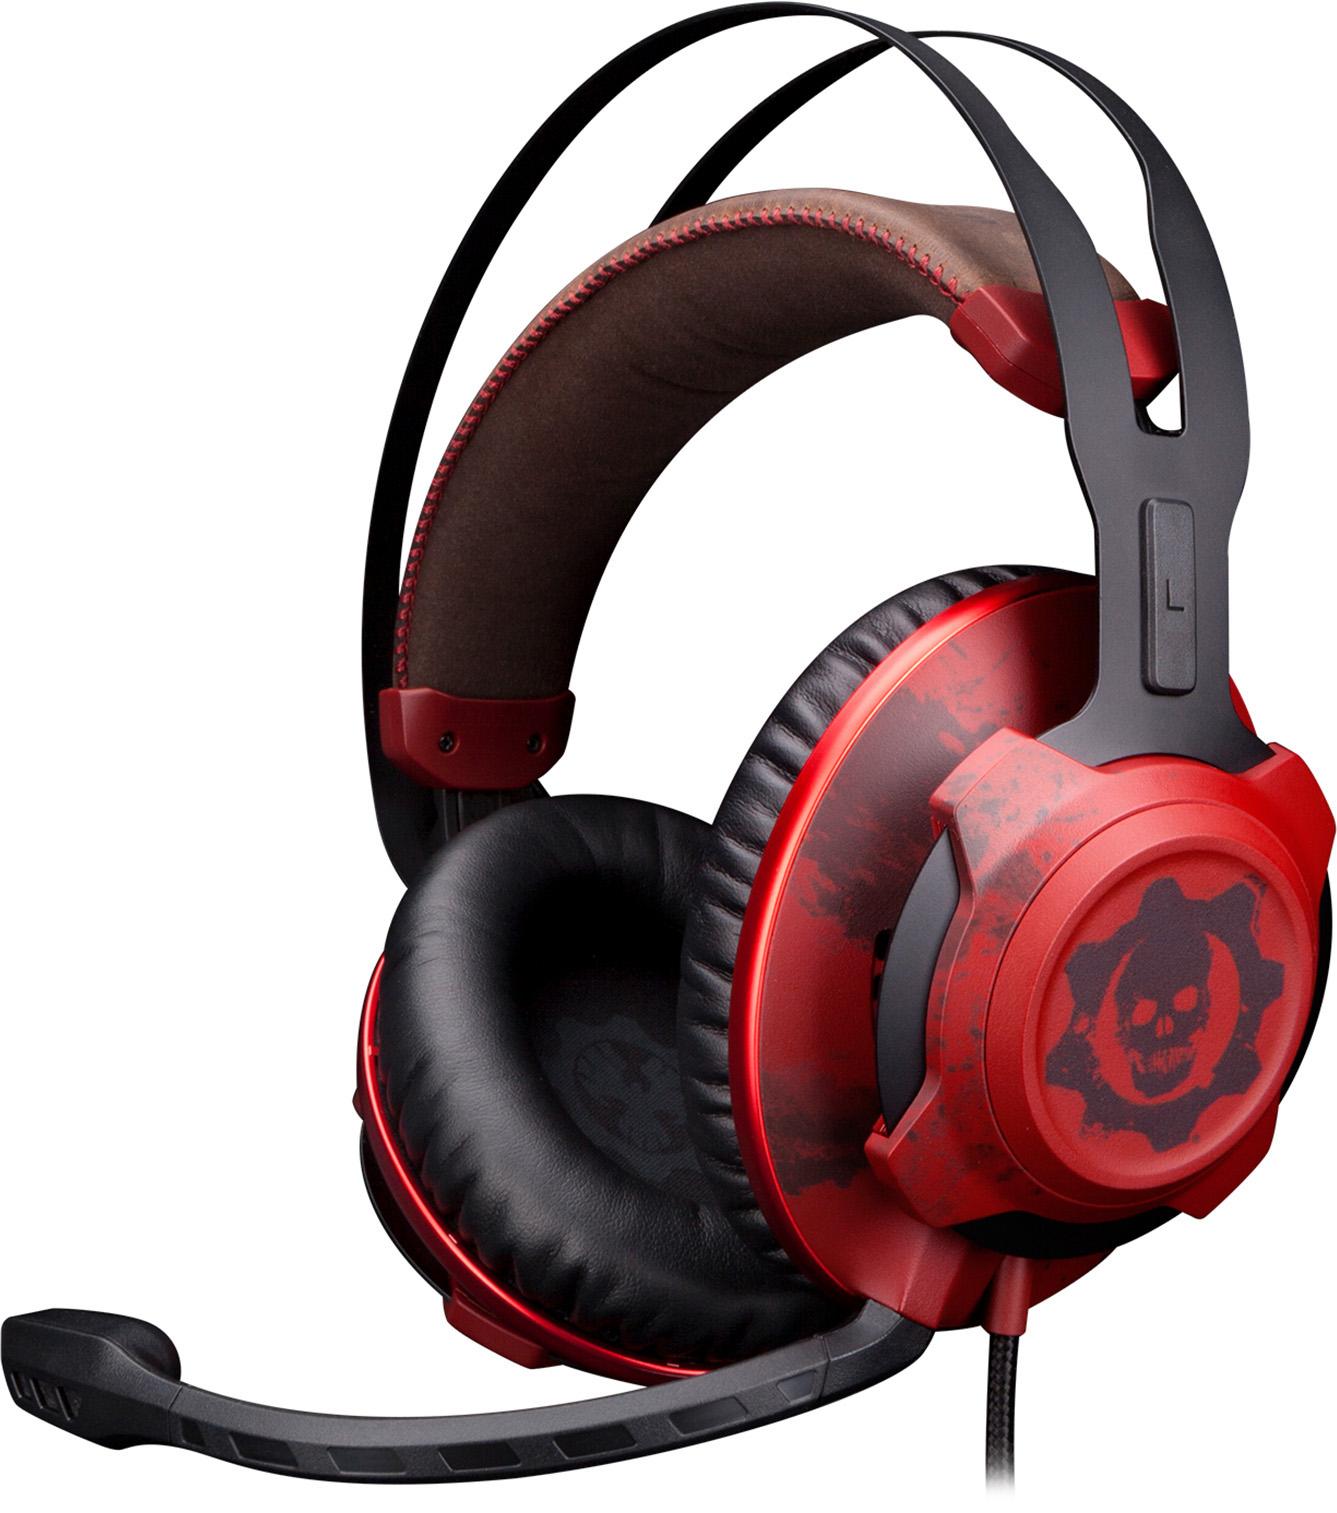 HyperX CloudX Gears of War Gaming Headset